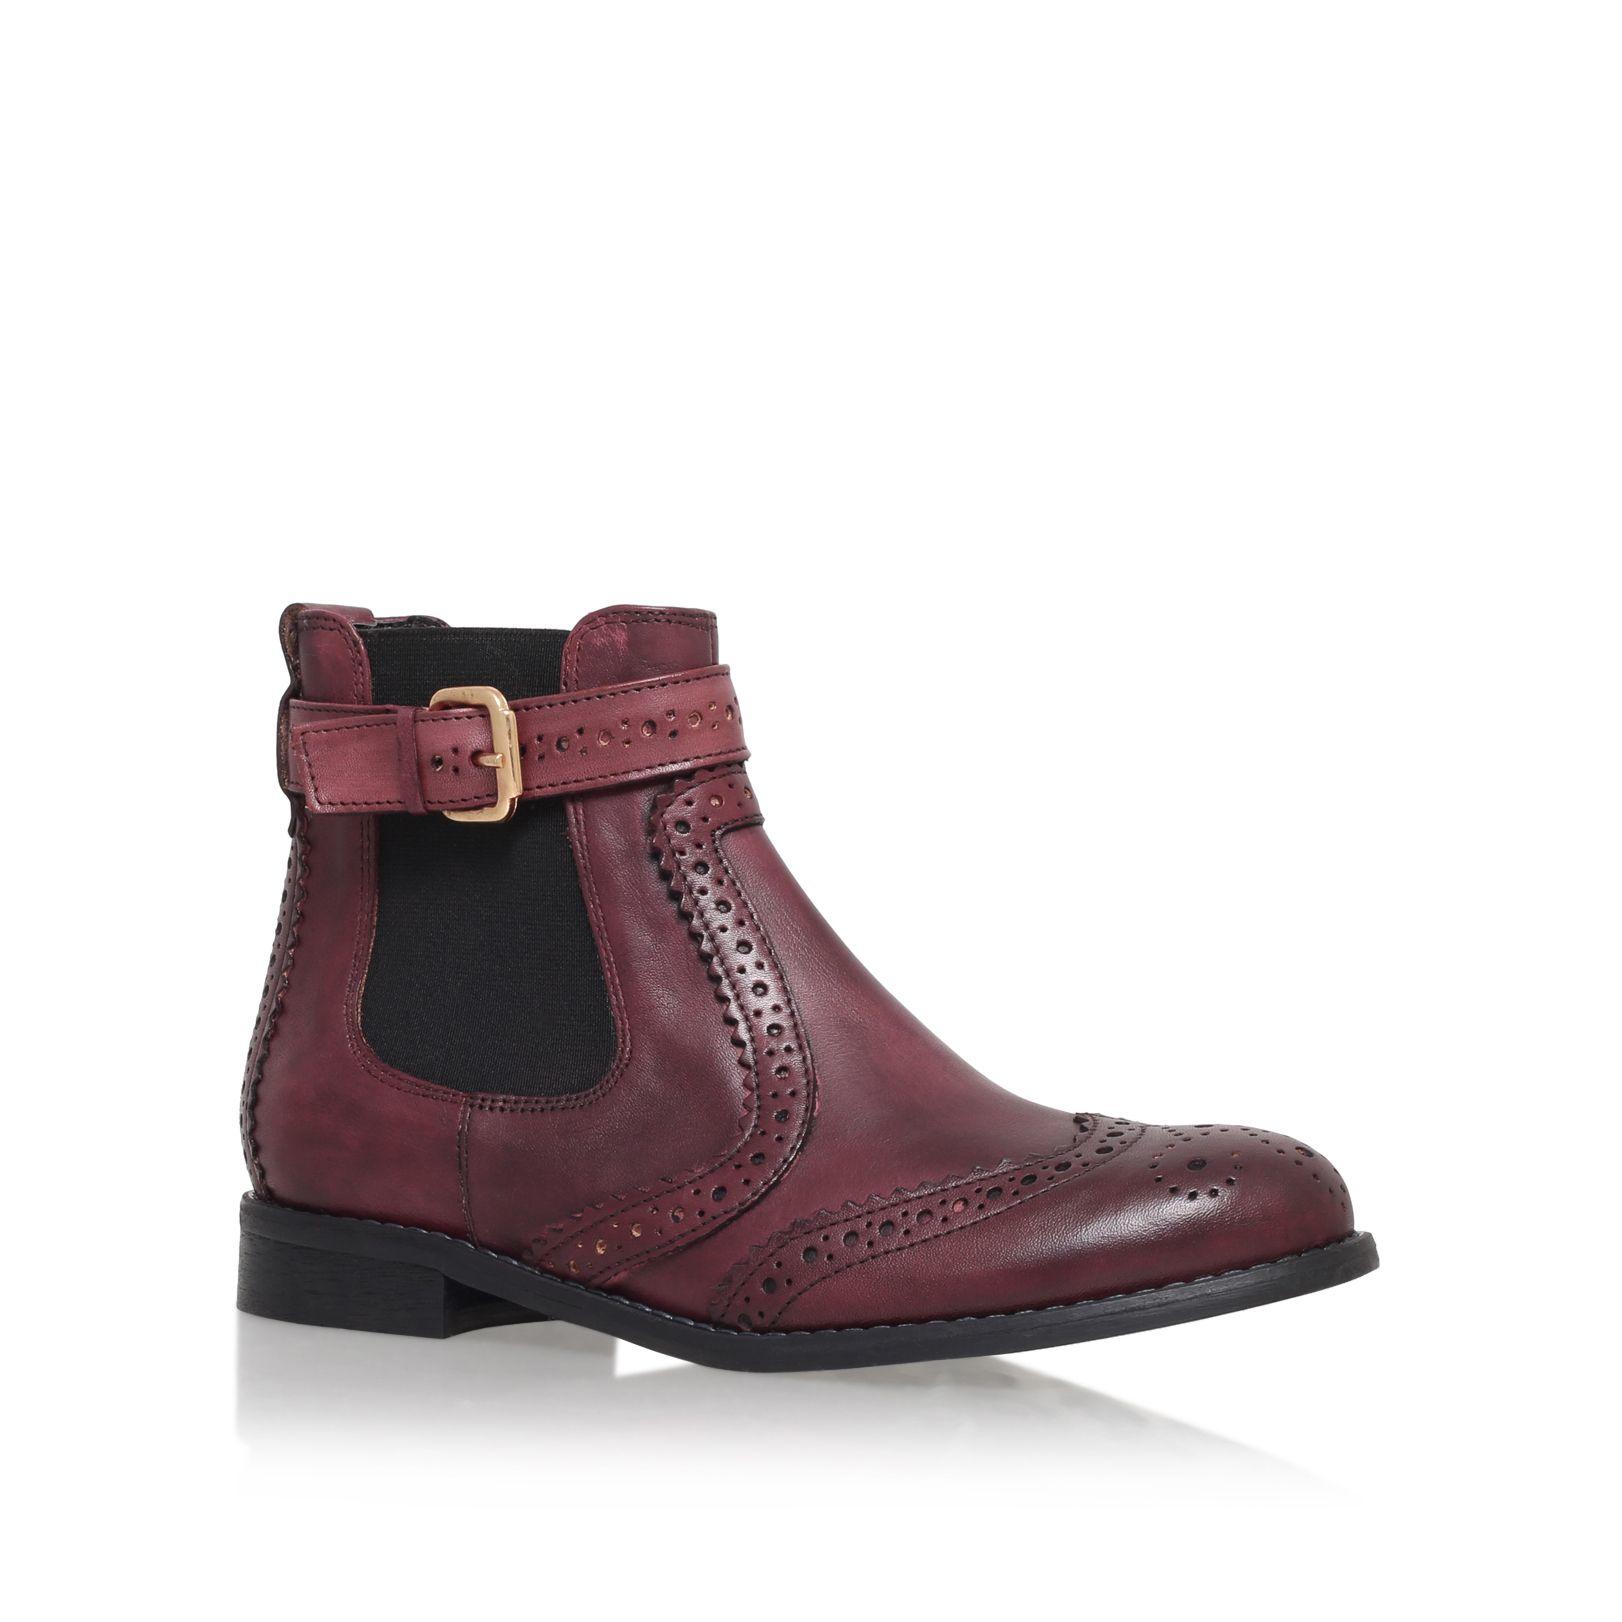 Carvela Kurt Geiger Slow Chelsea Boots In Purple For Men | Lyst